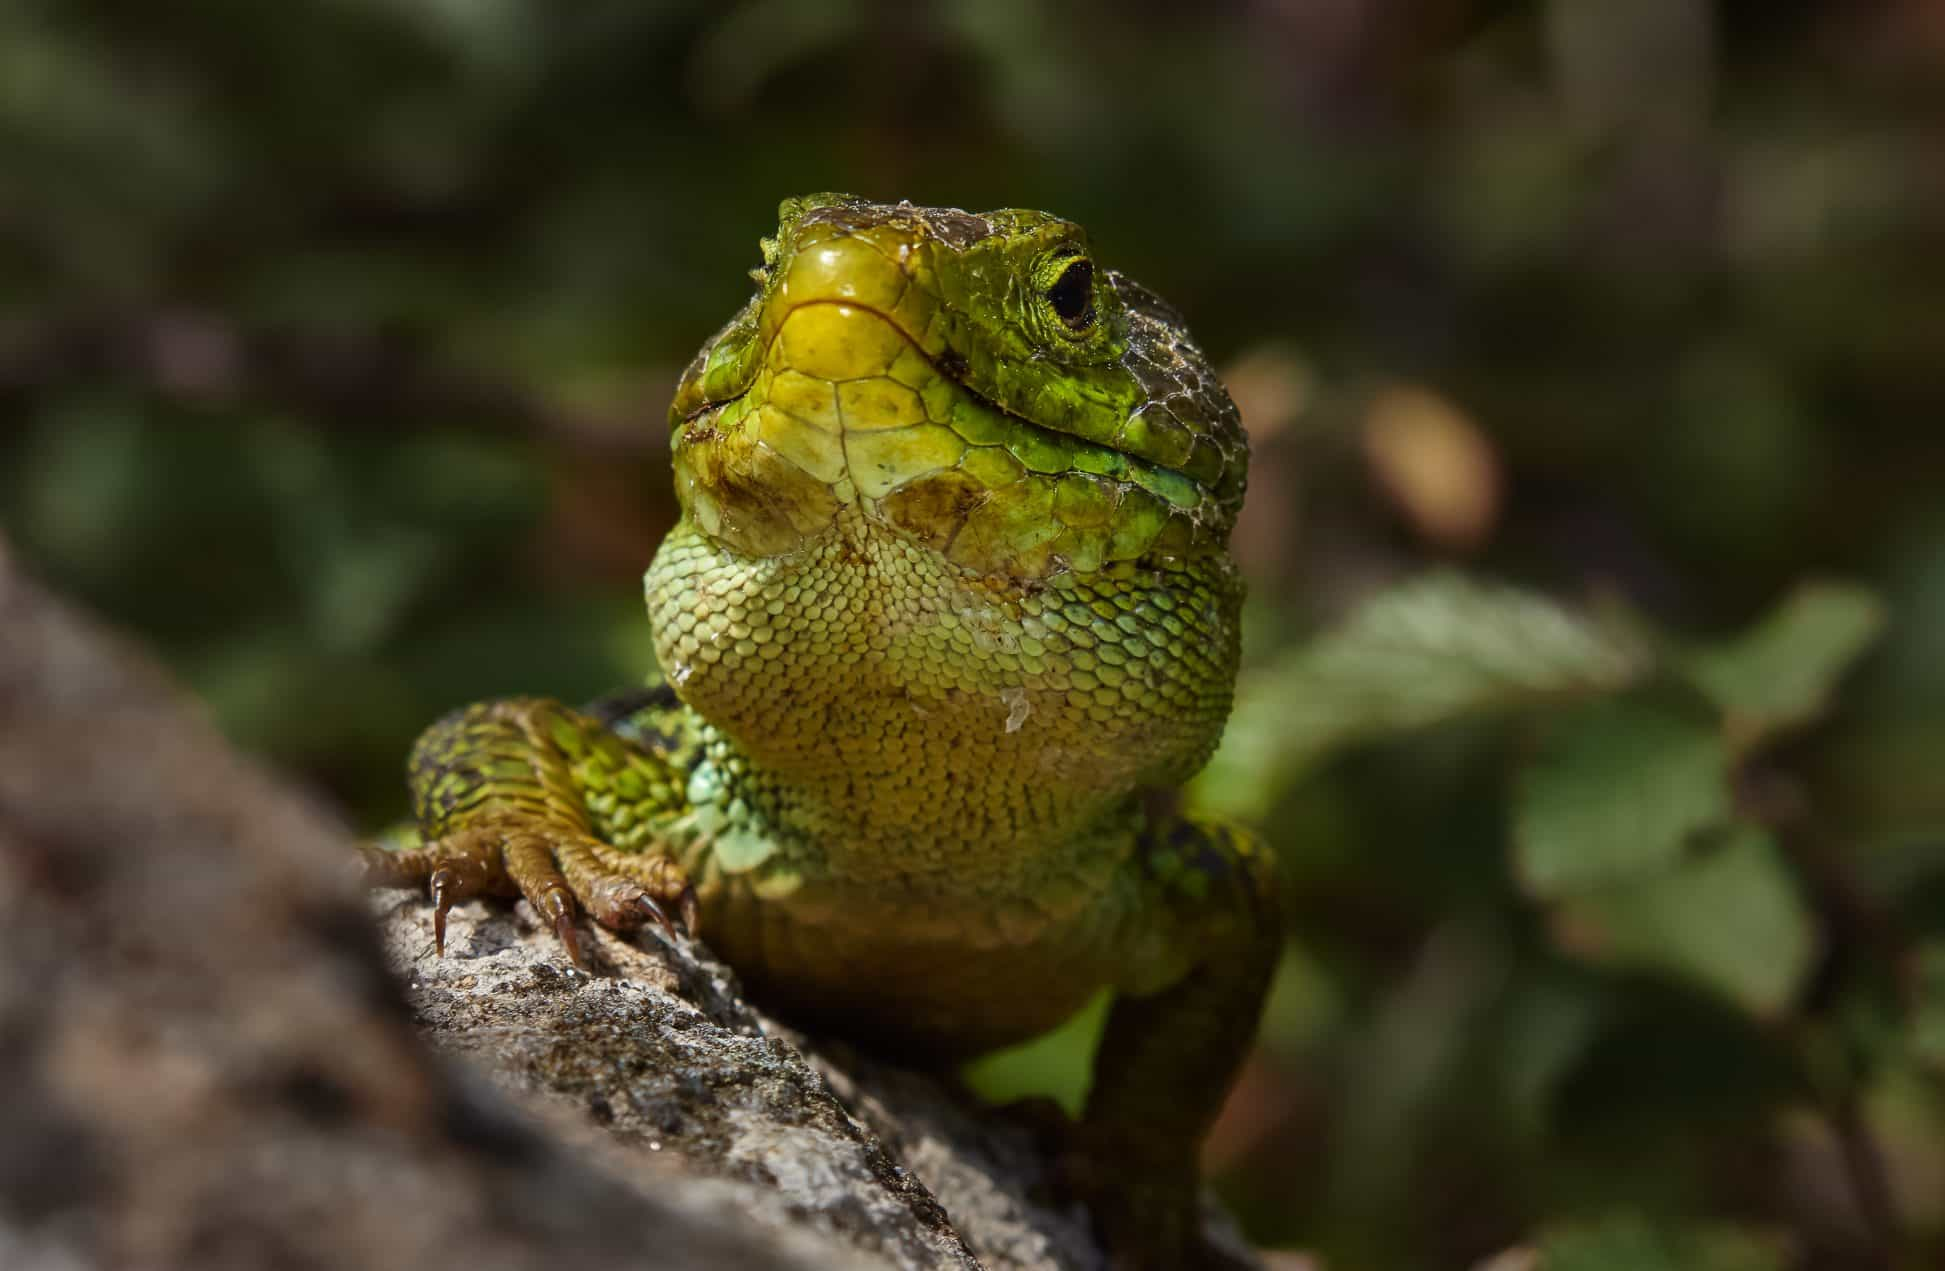 Super Image libre: reptile, lézard, faune, nature, animal, sauvage  JP82